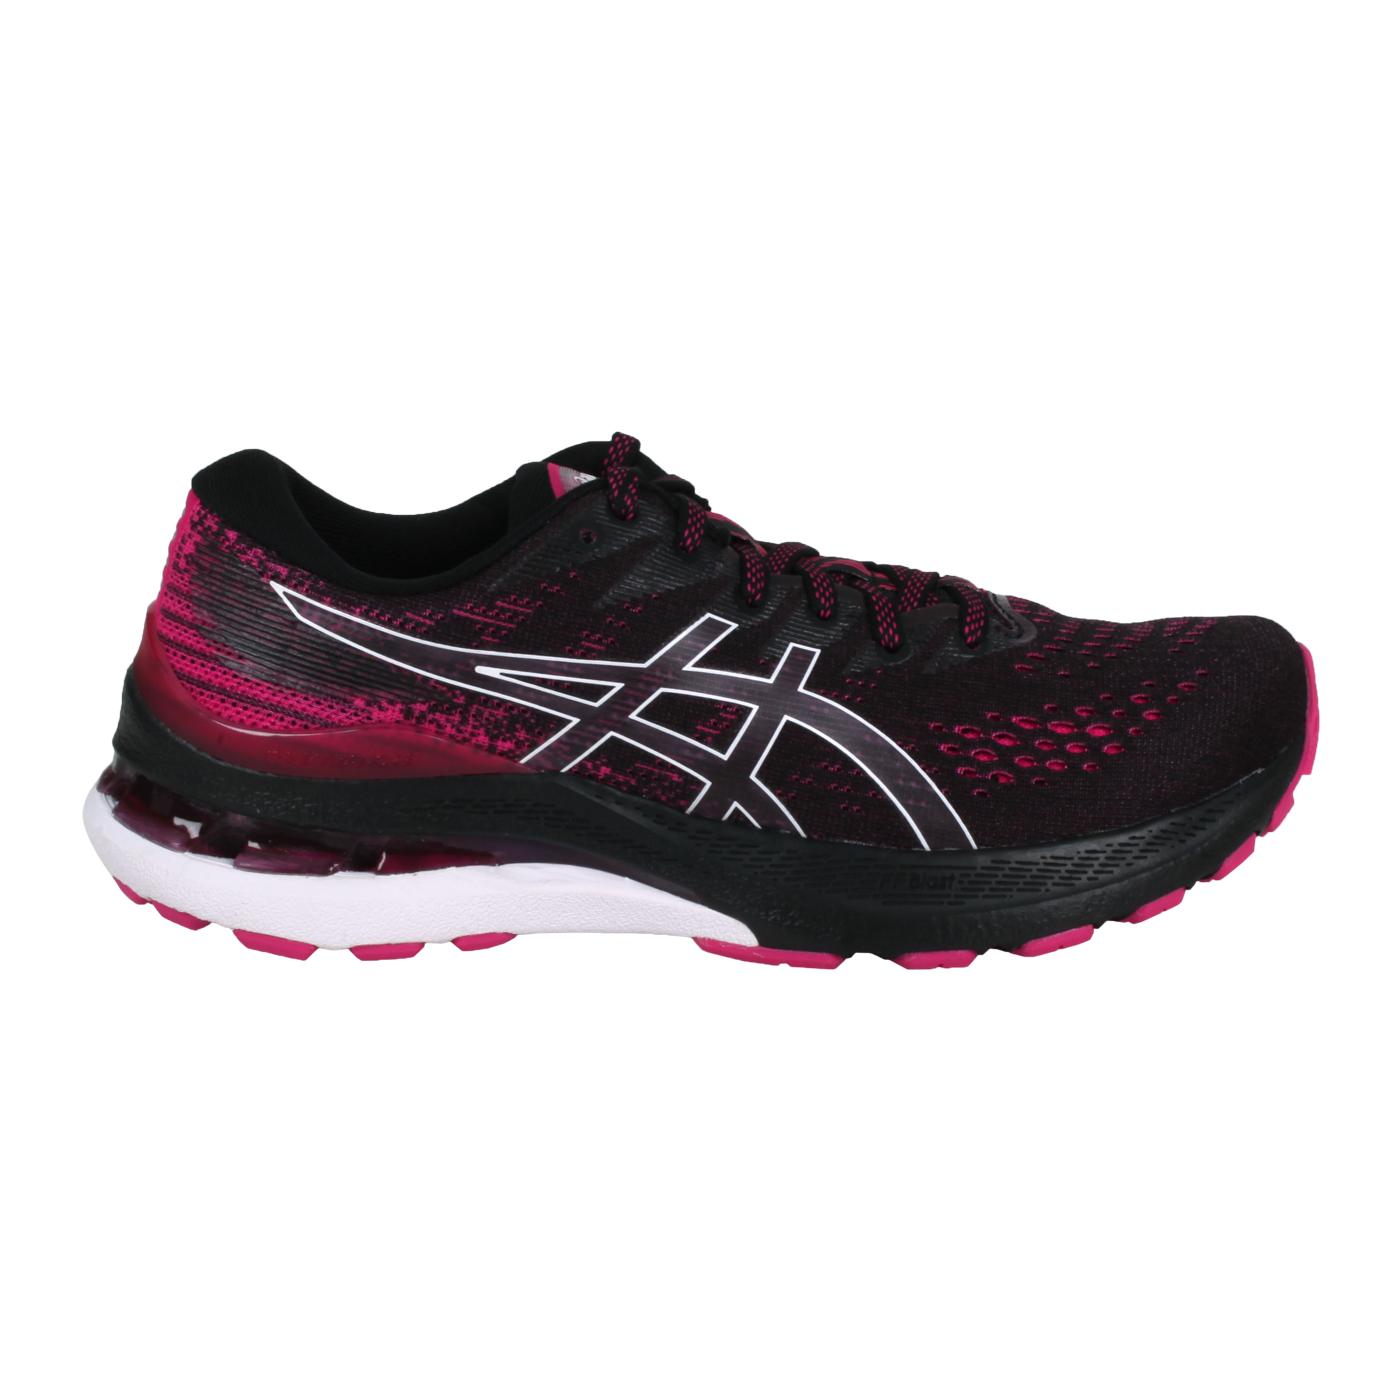 ASICS 特定-女款慢跑鞋  @GEL-KAYANO 28@1012B047-002 - 黑桃紅